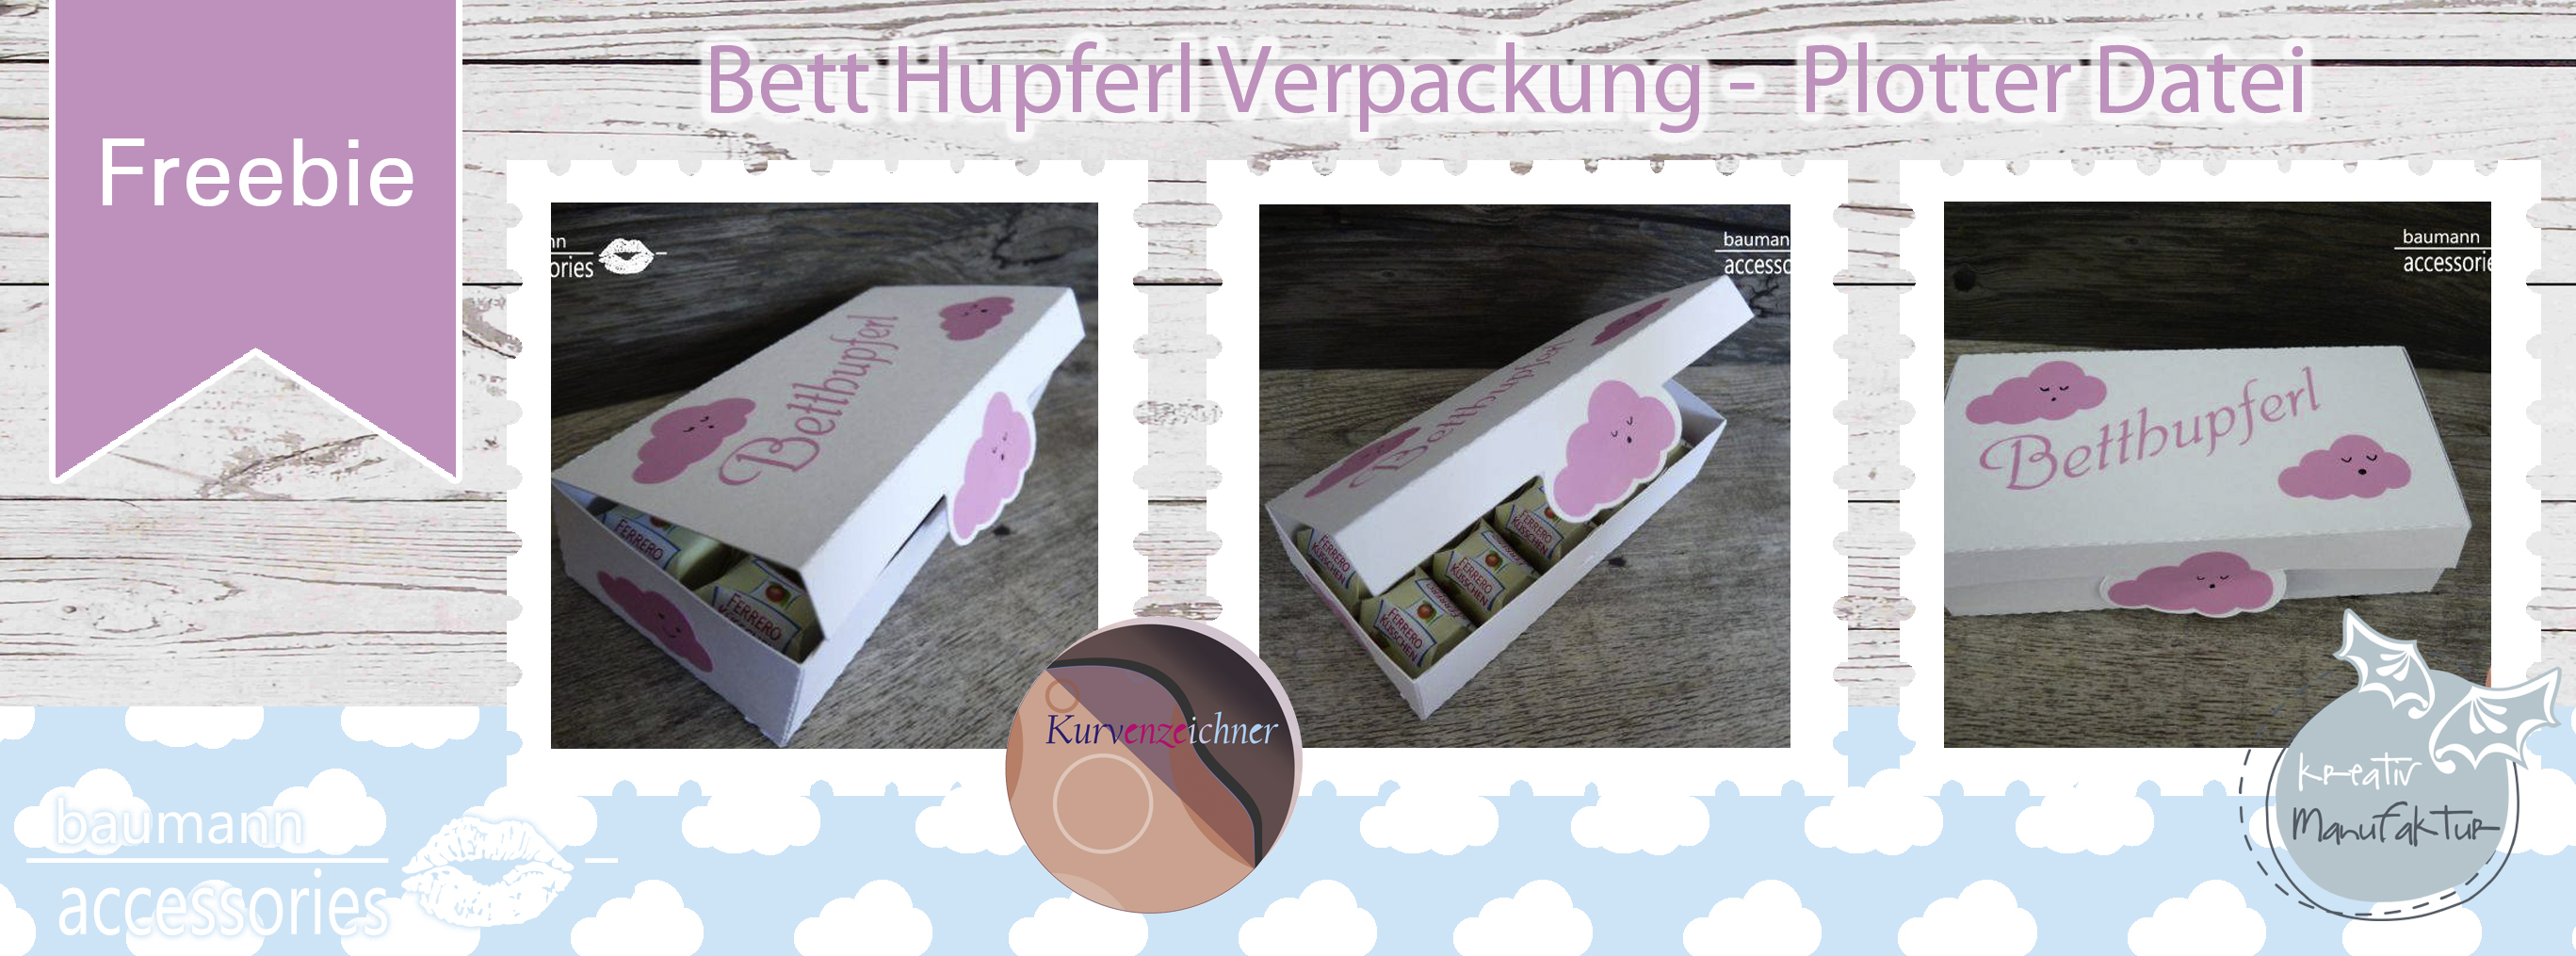 Collage Freebie Betthupferl Verpackung1